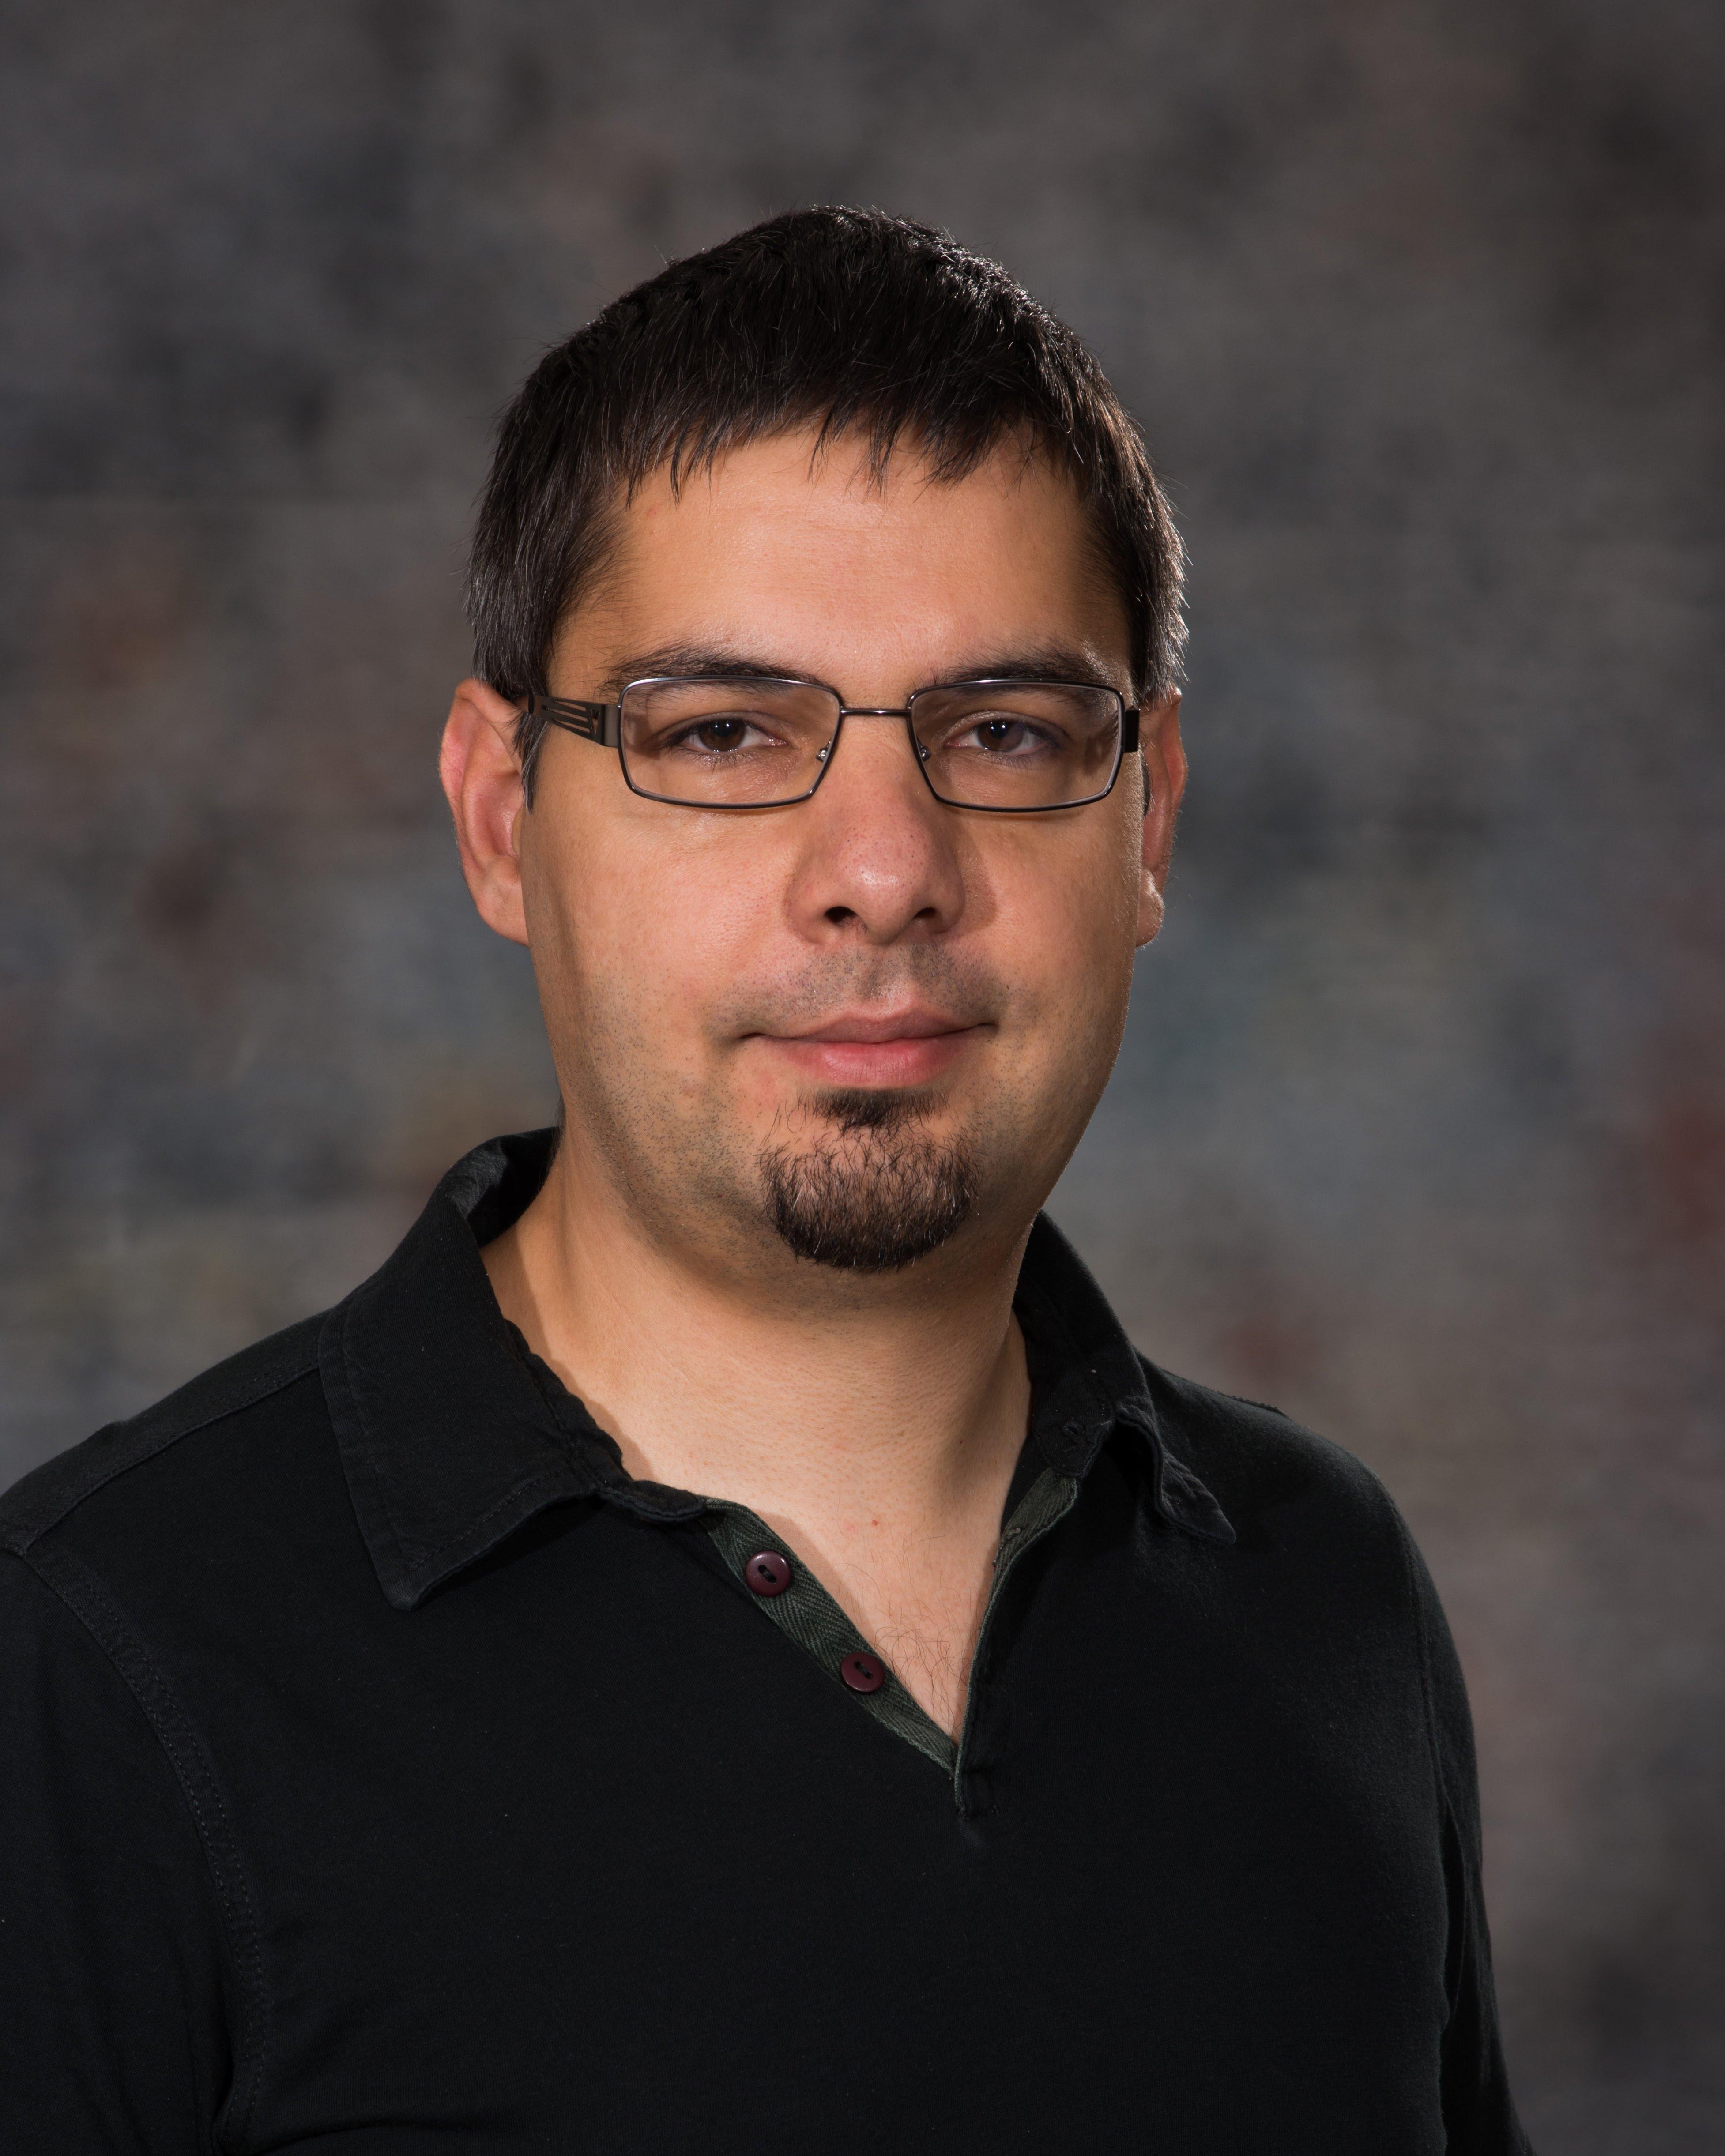 Prof. Alexey Kovalev